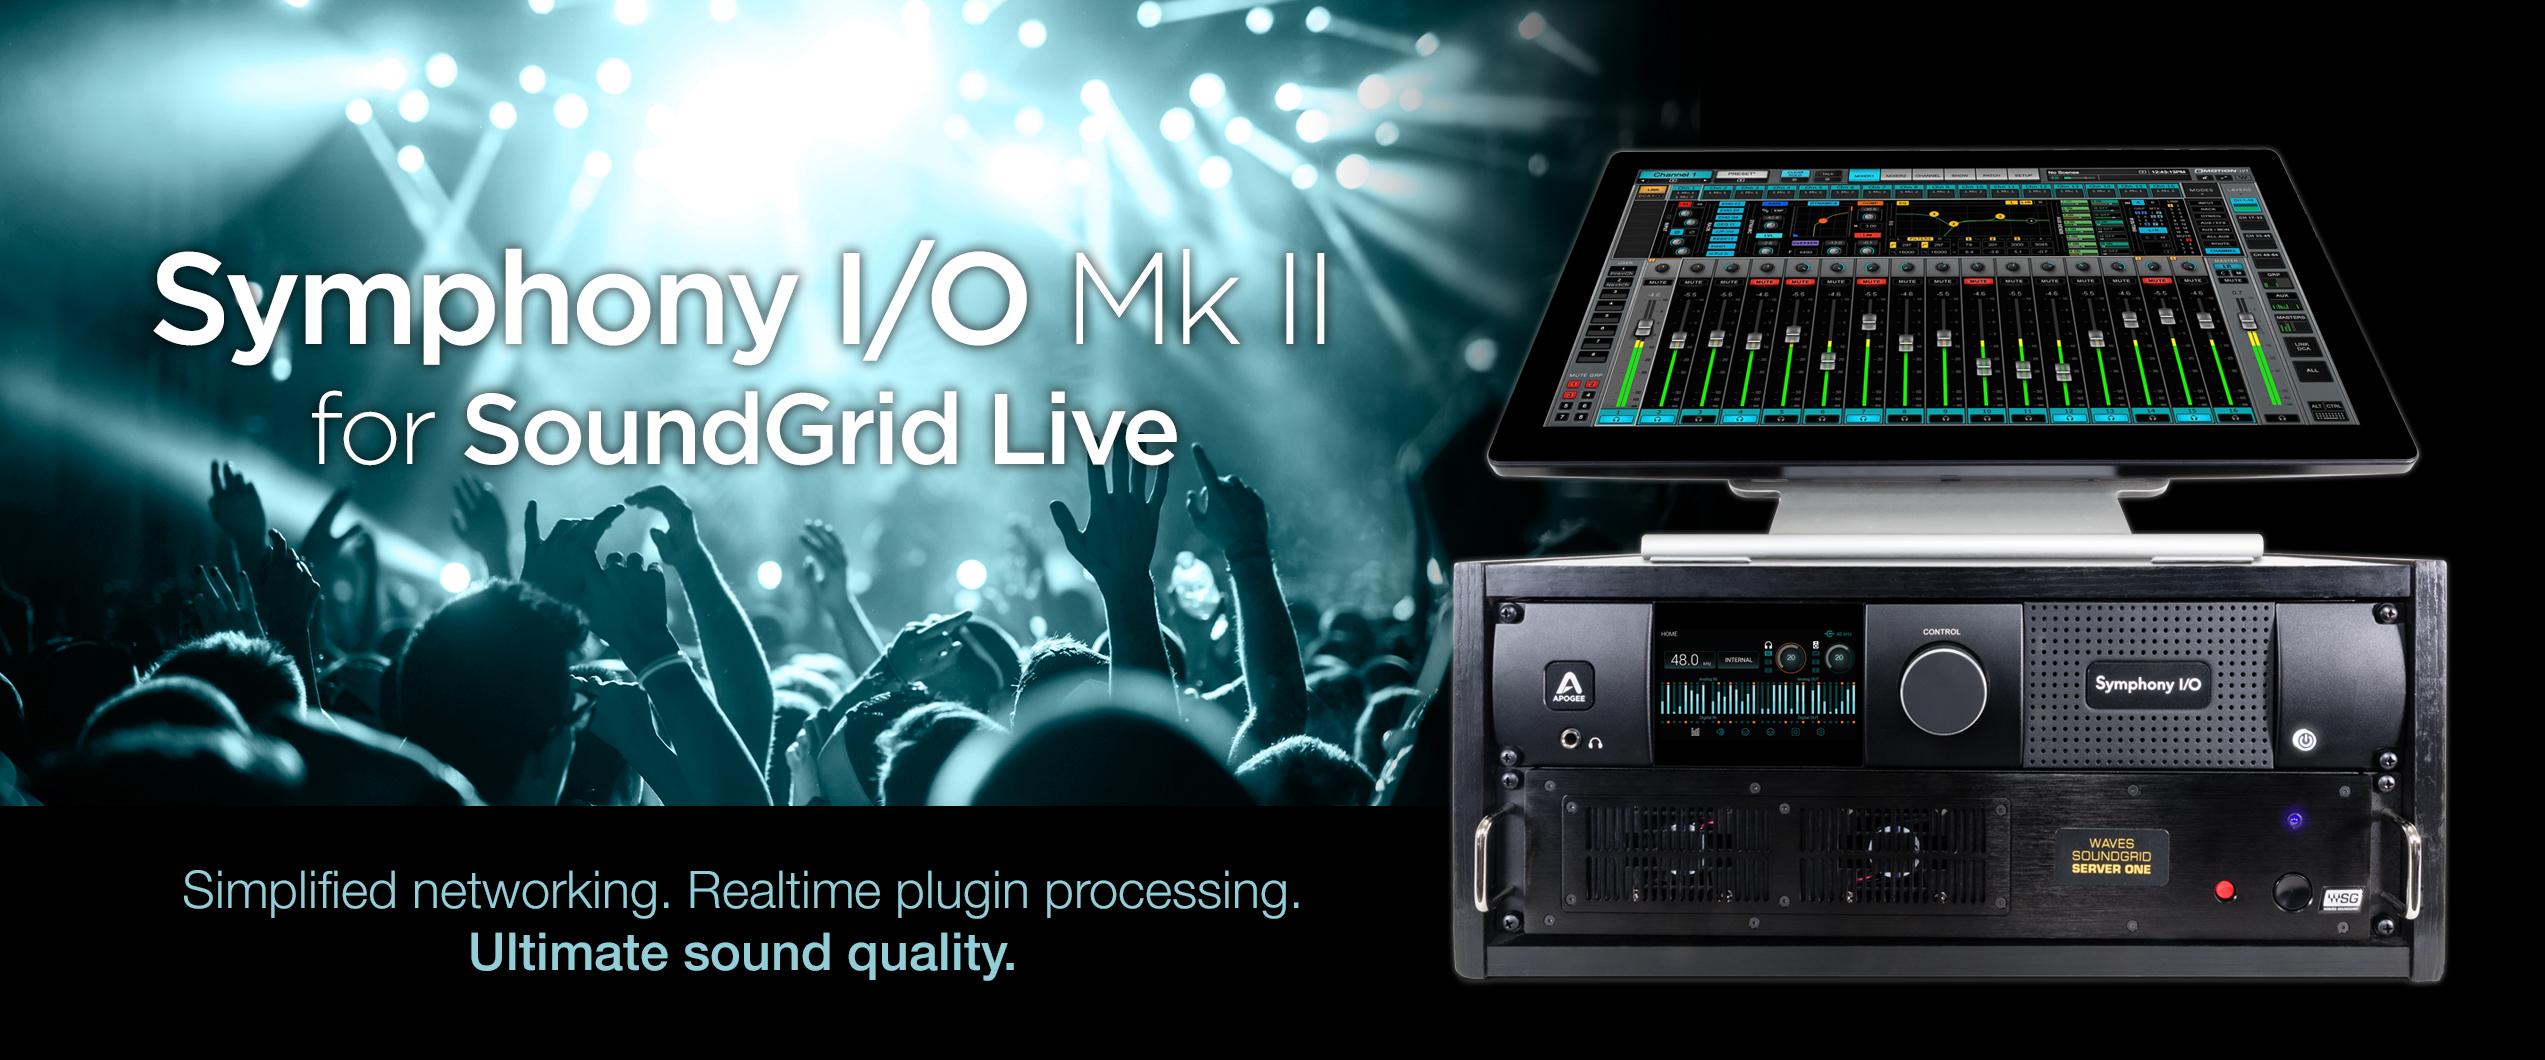 Symphony I/O Mk II - SoundGrid - Apogee Electronics